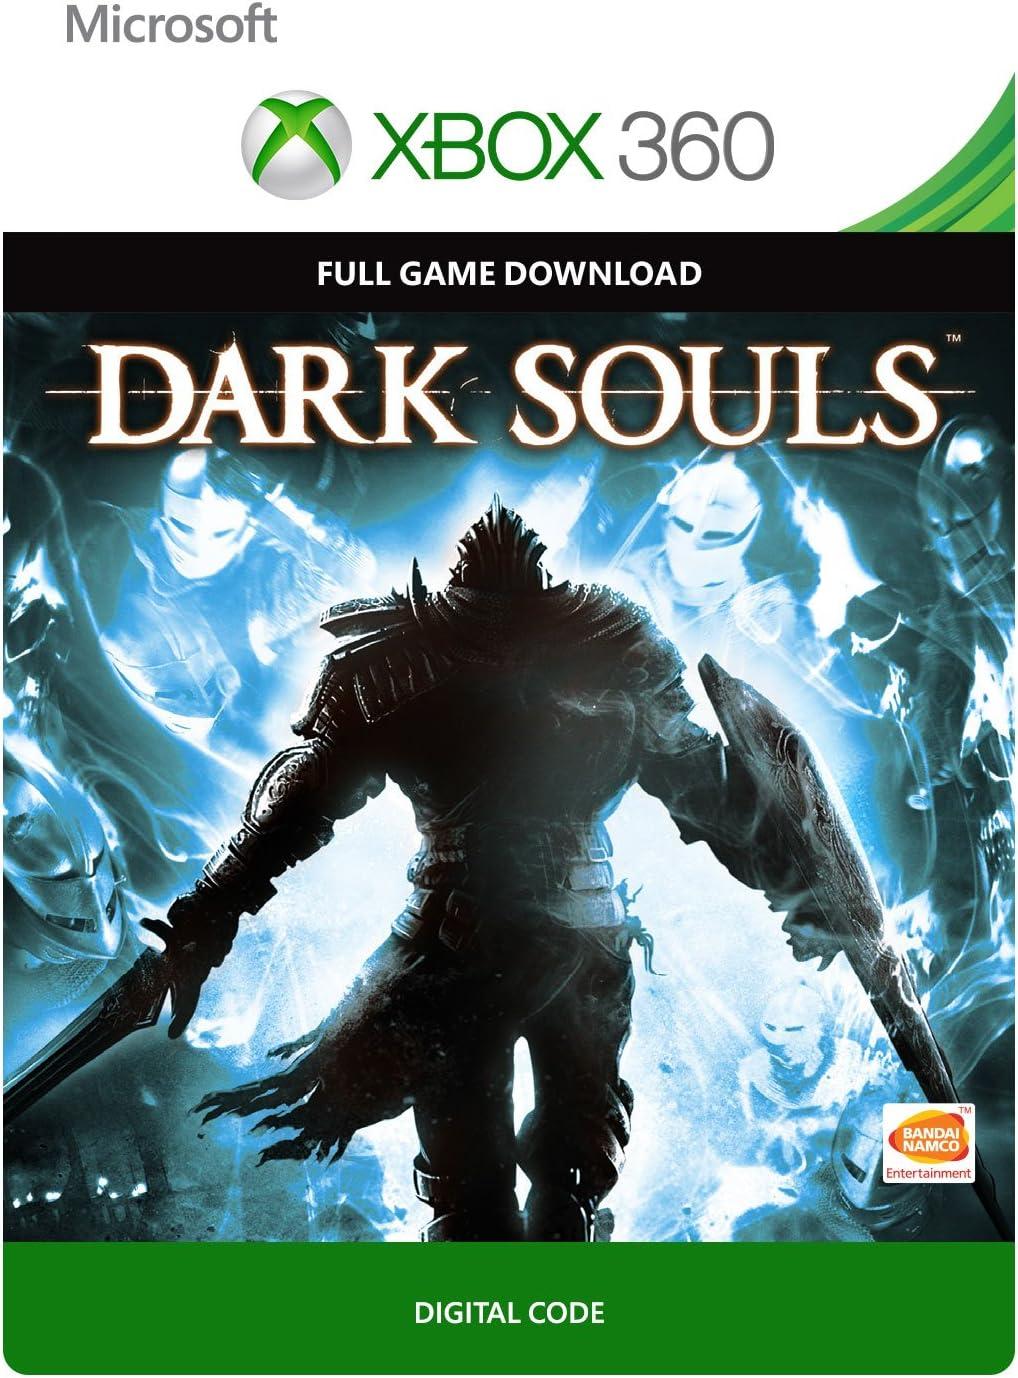 Amazon com: Dark Souls - Xbox 360 Digital Code: Video Games